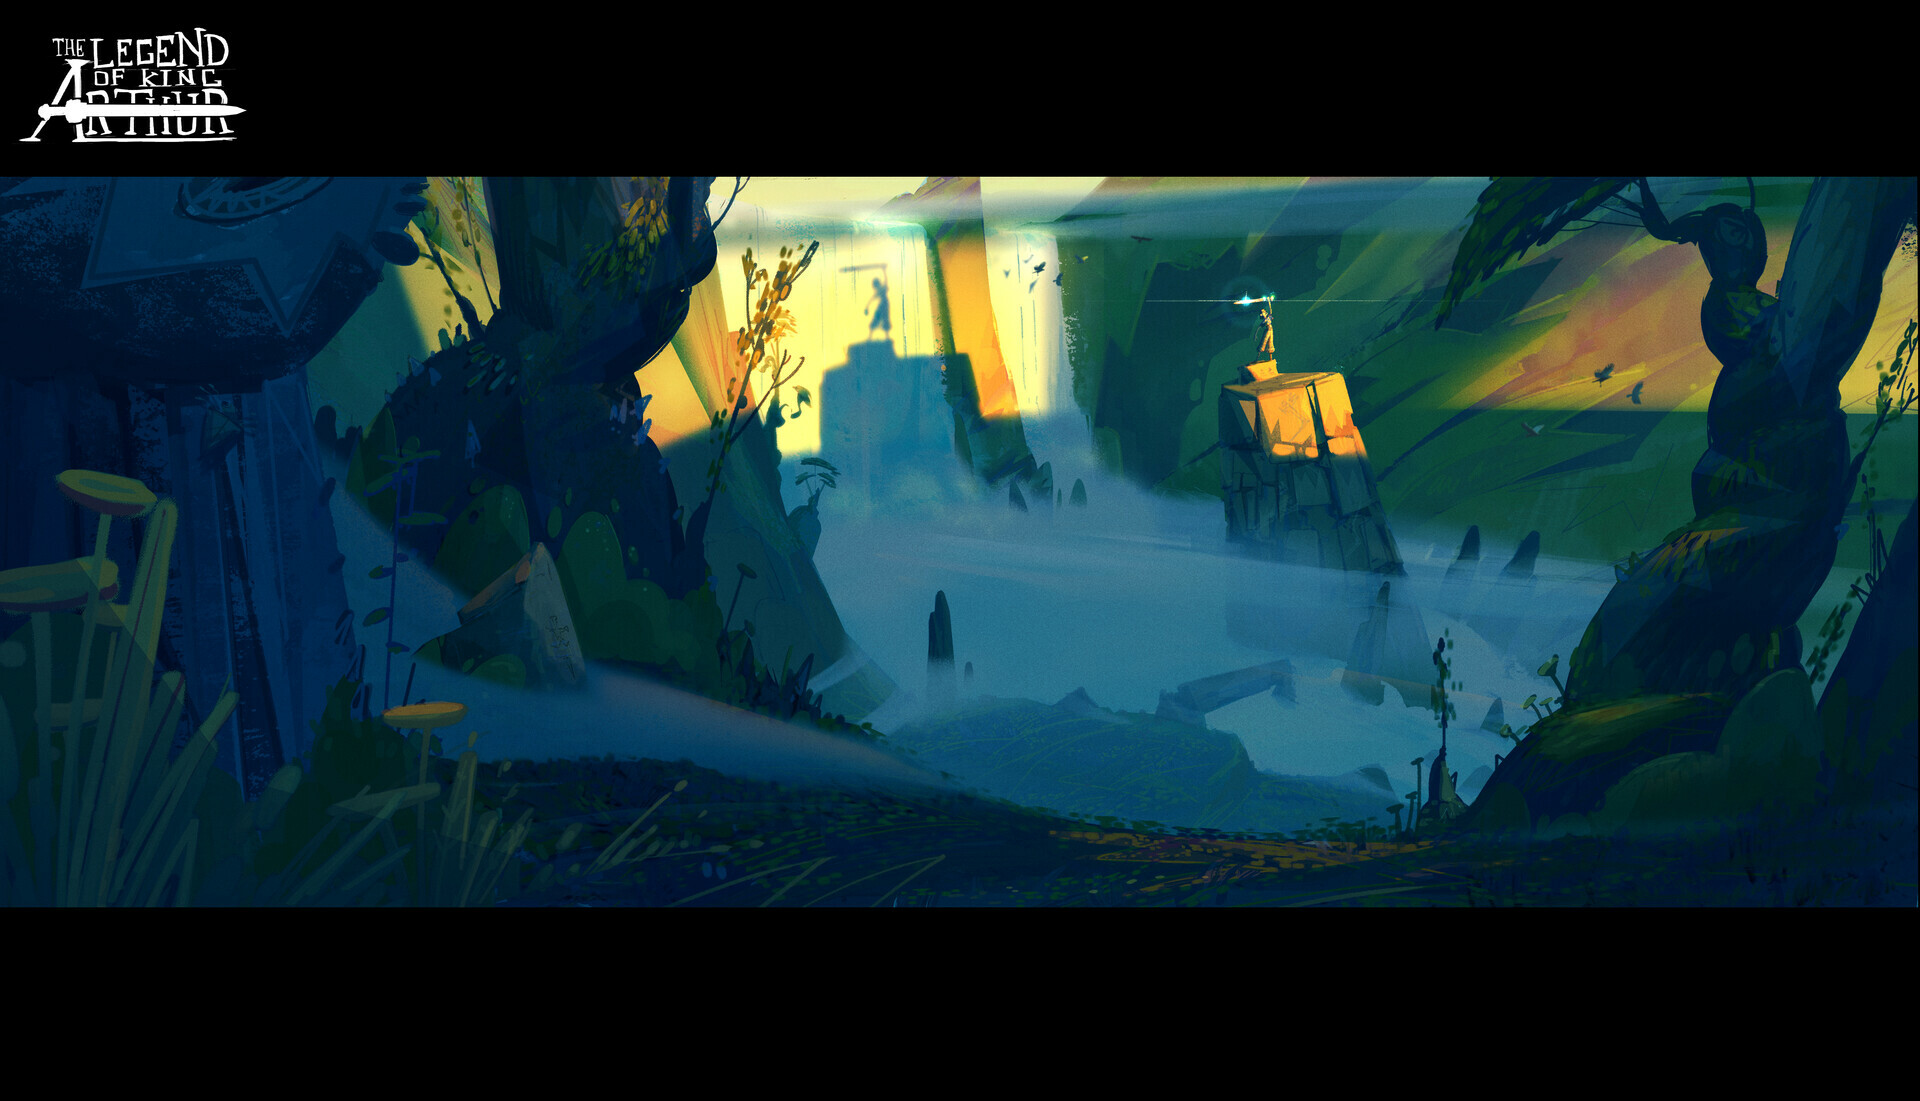 Fabia sans arthur legent artstation sword 02